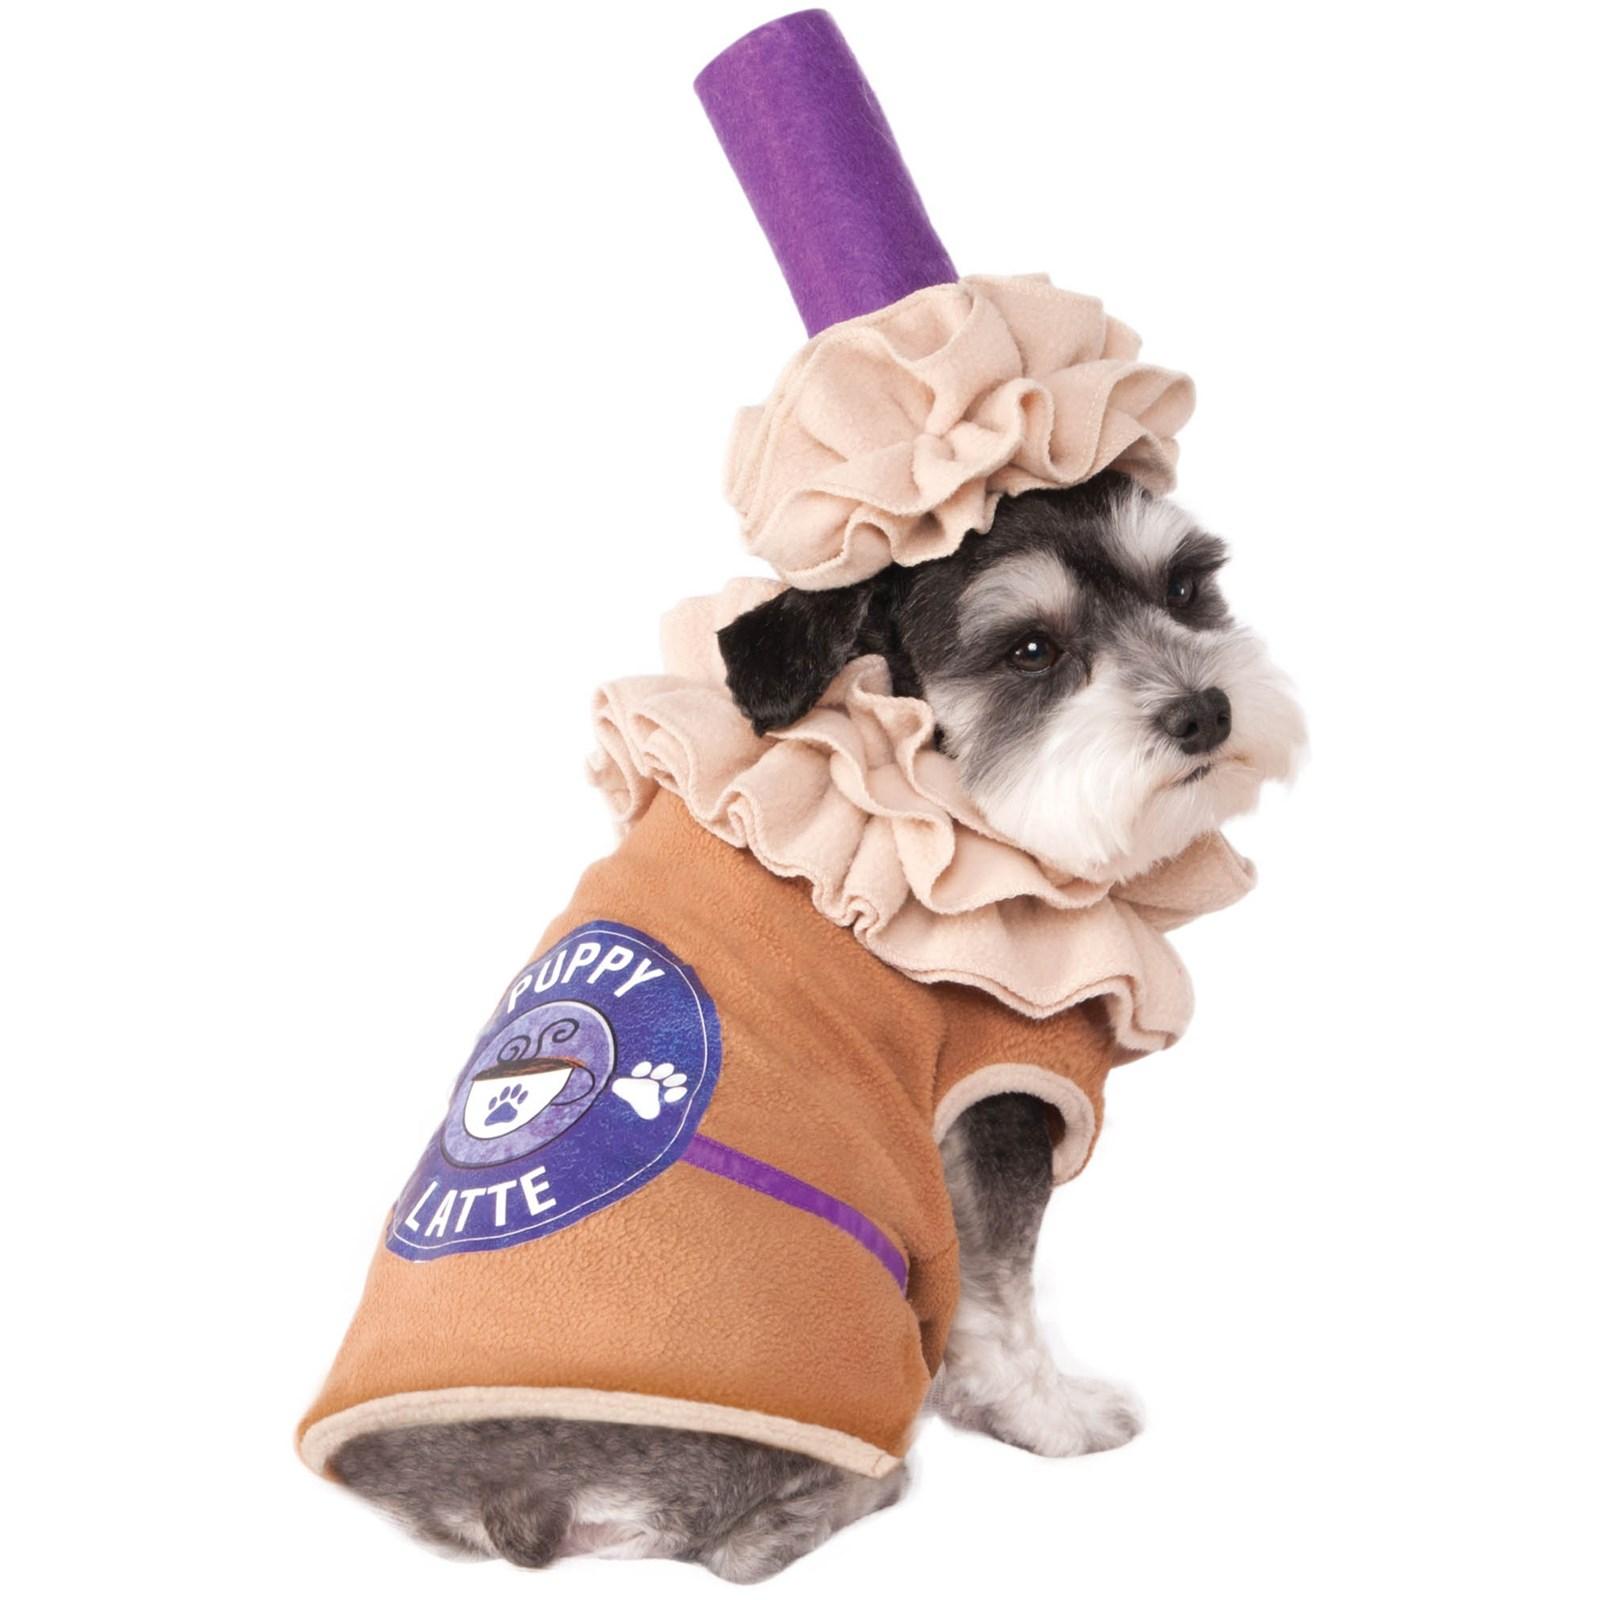 Puppy Latte Pet Halloween Costume